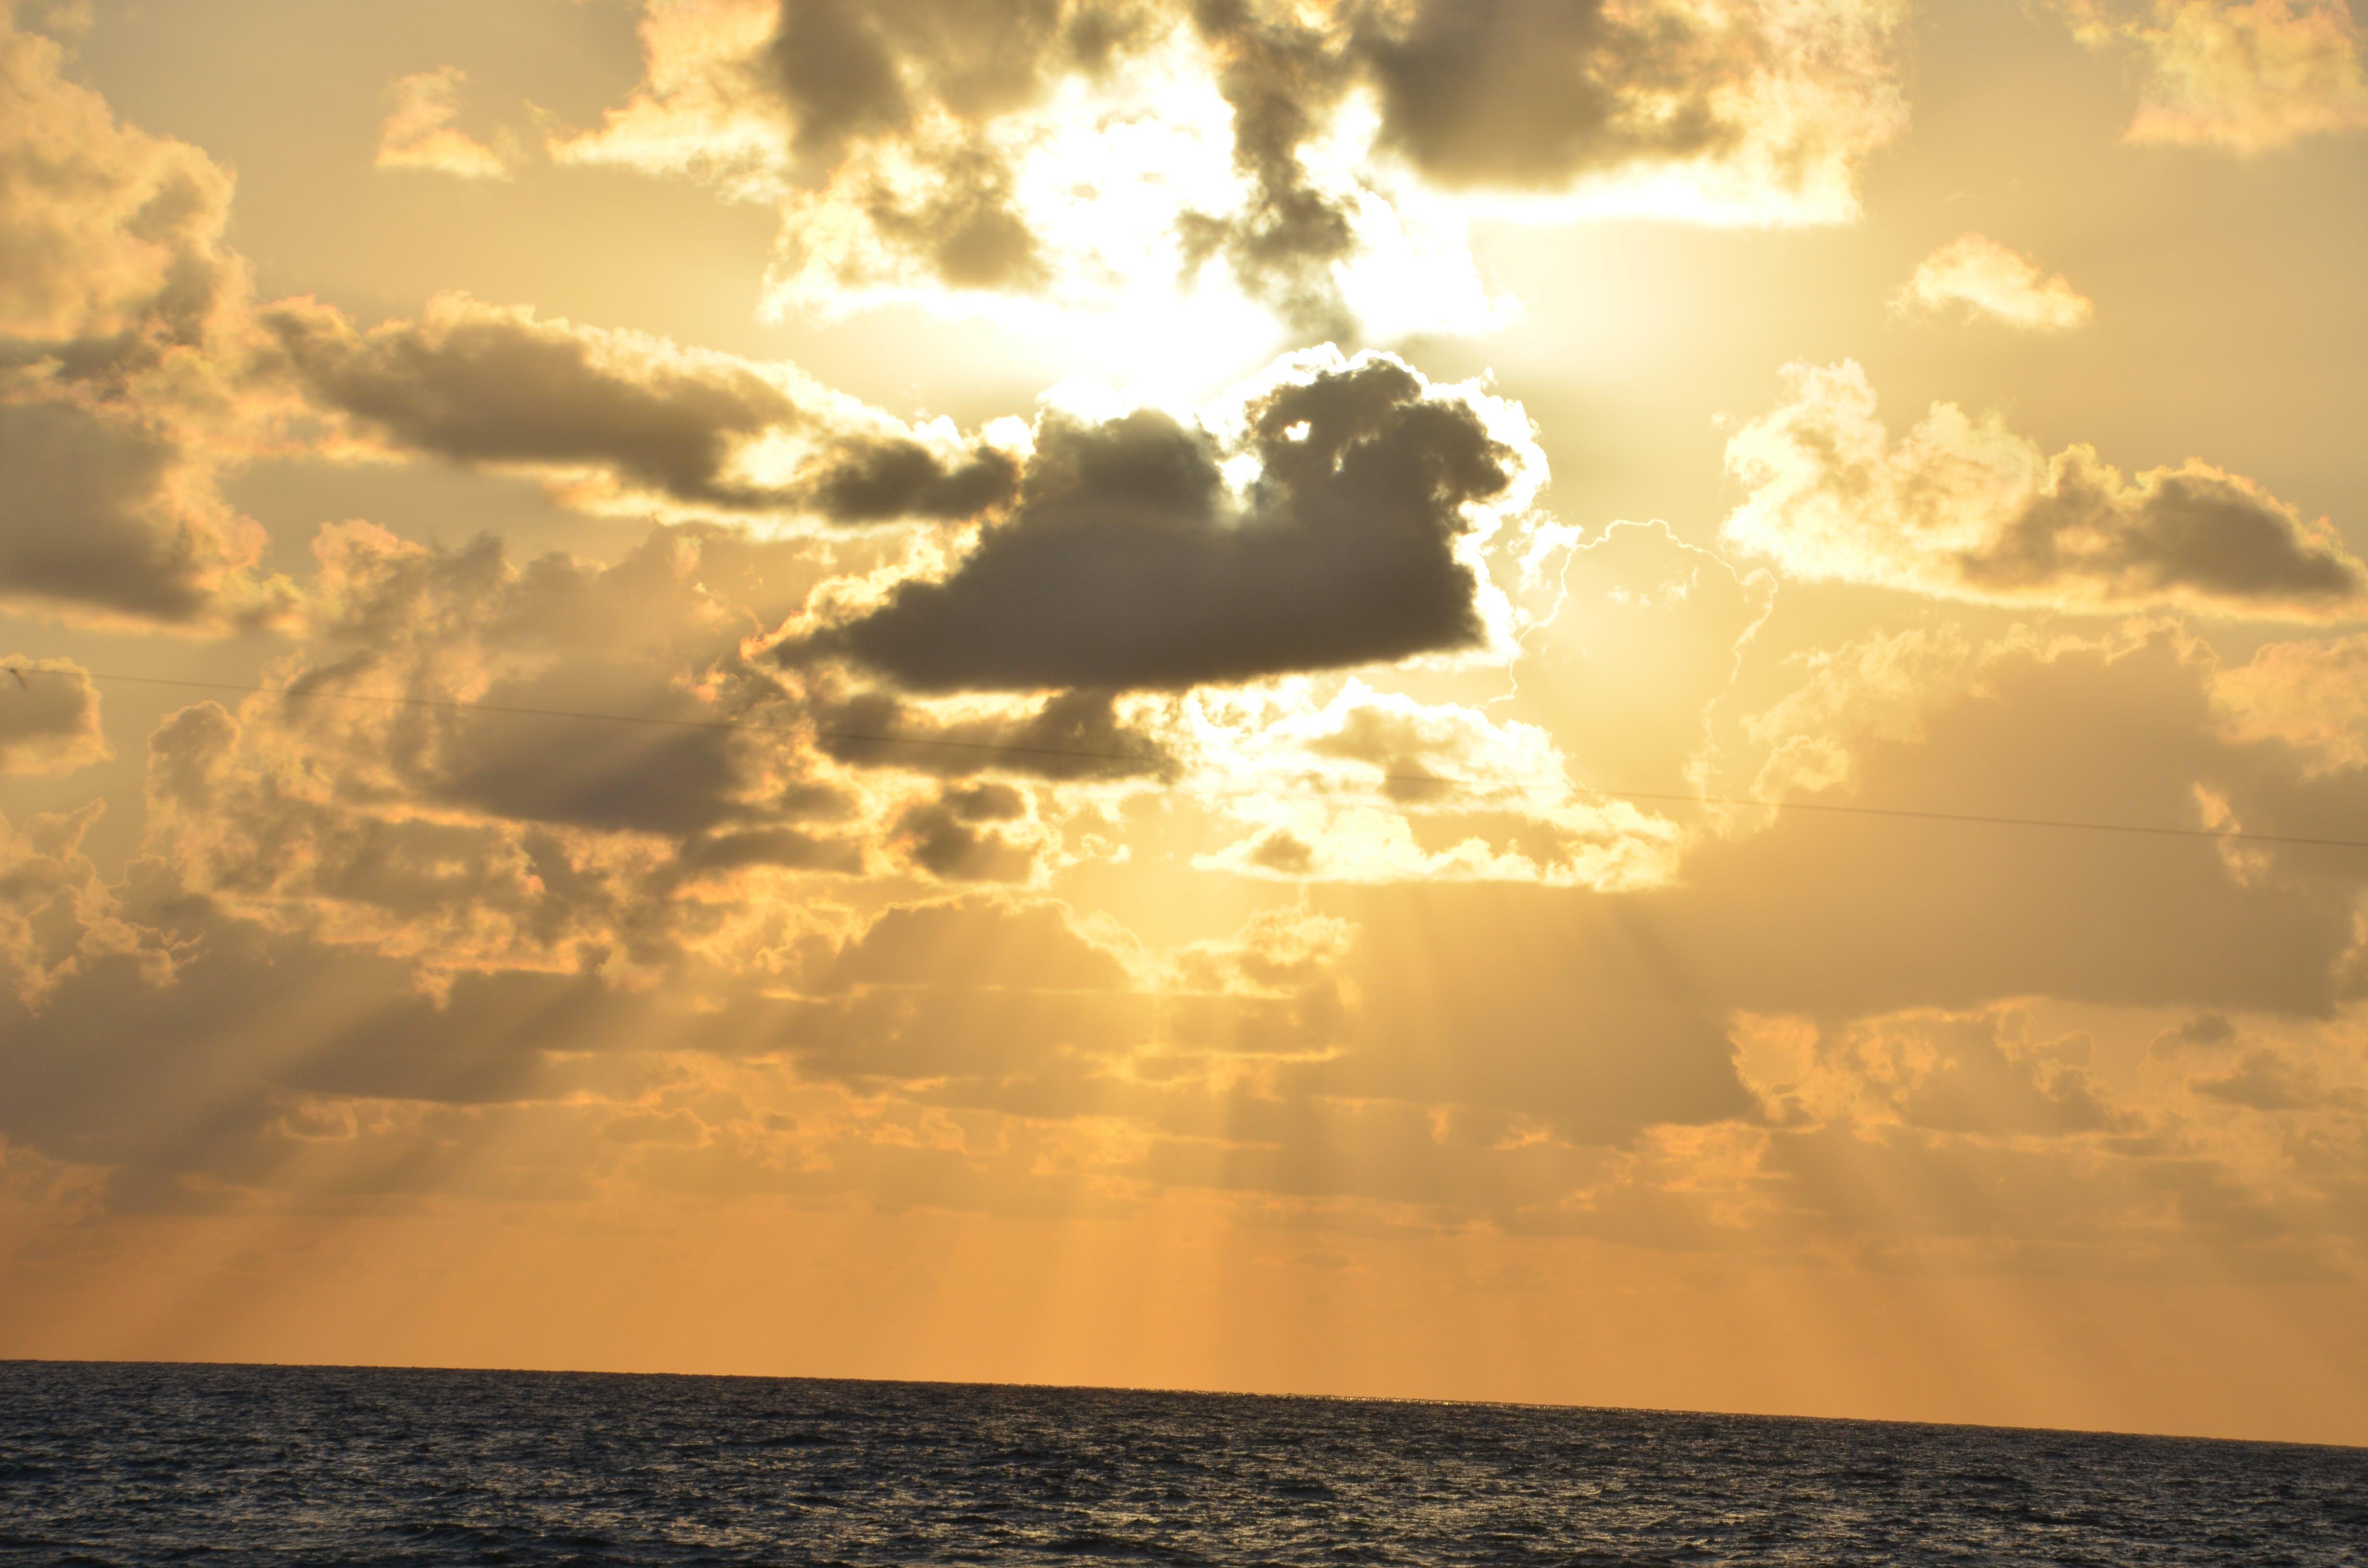 Sunlight Through Clouds during Daylight